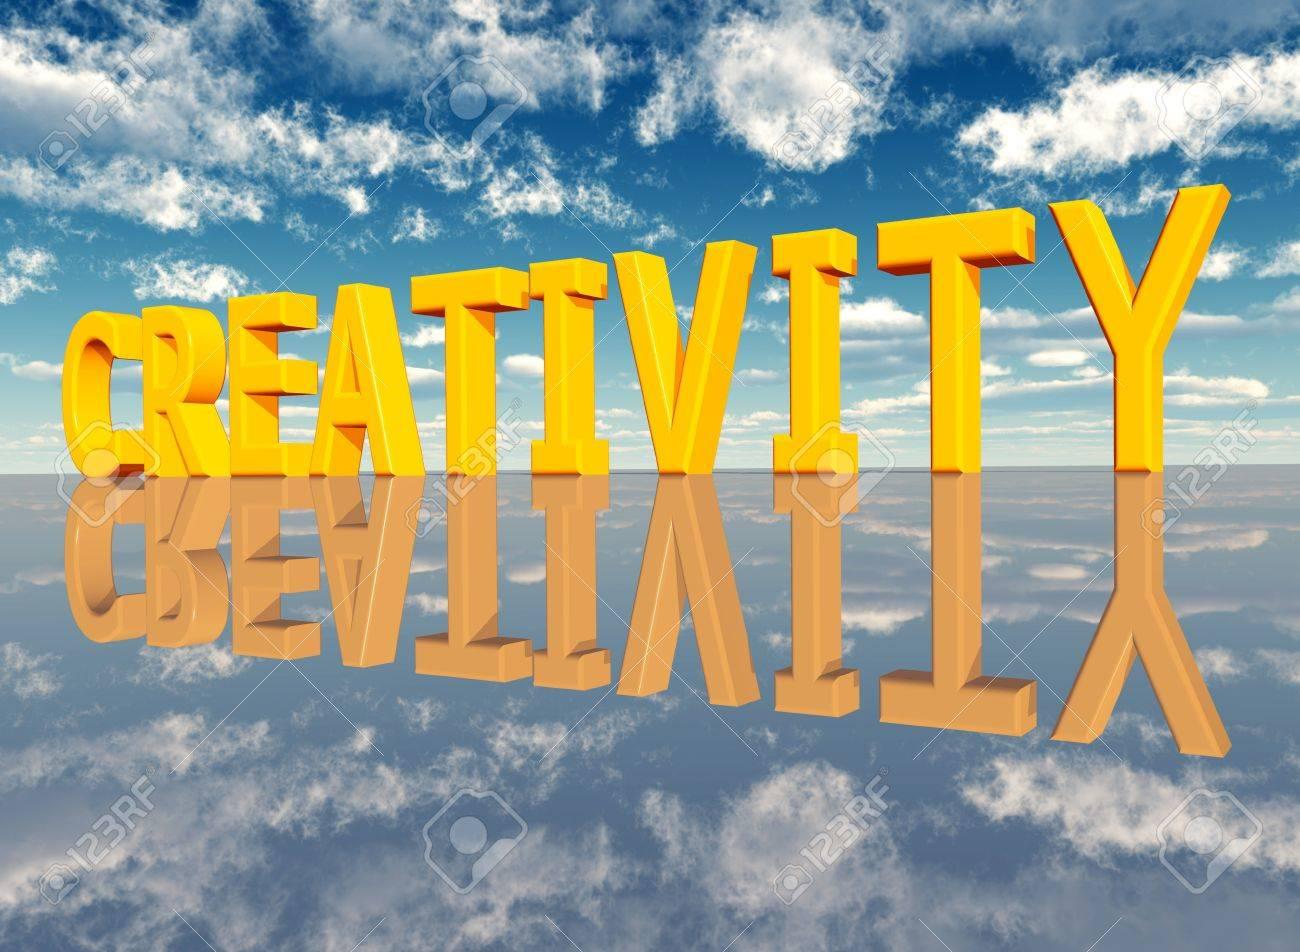 The Word Creativity Stock Photo - 17041470